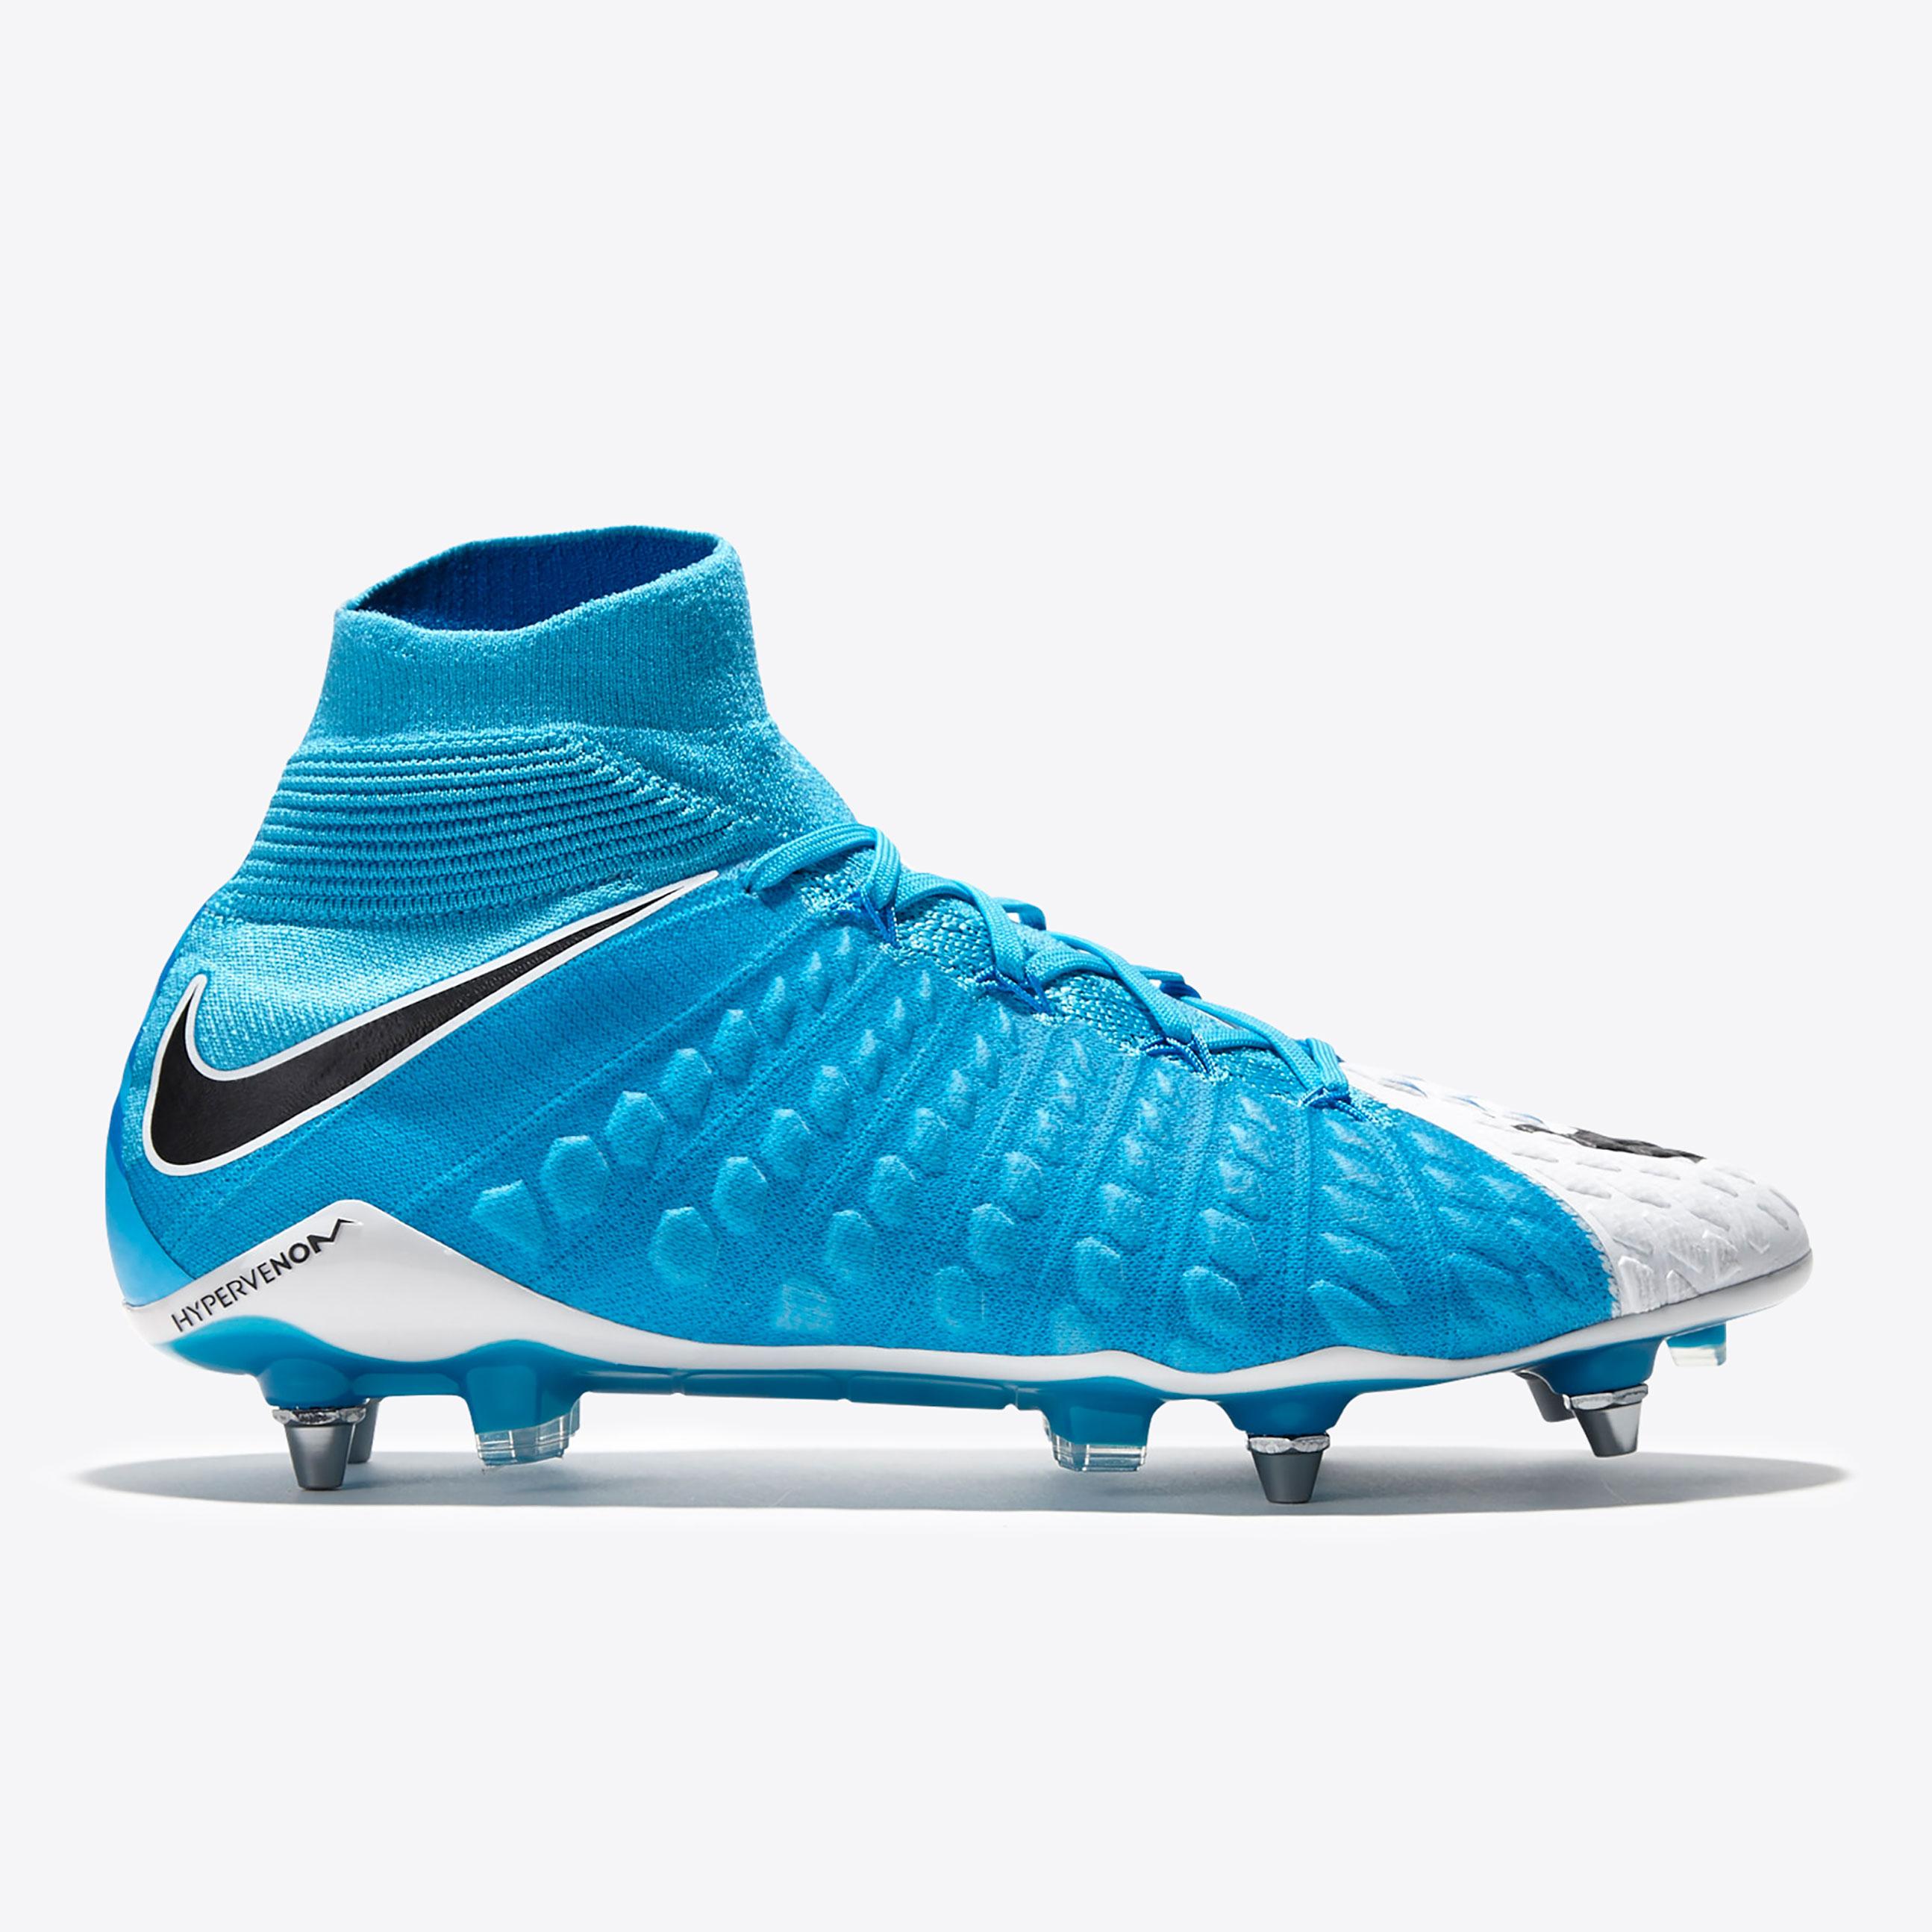 211b8b9d886 Nike Hypervenom Phantom 3 DF SG-PRO Soft-Ground Football Boot